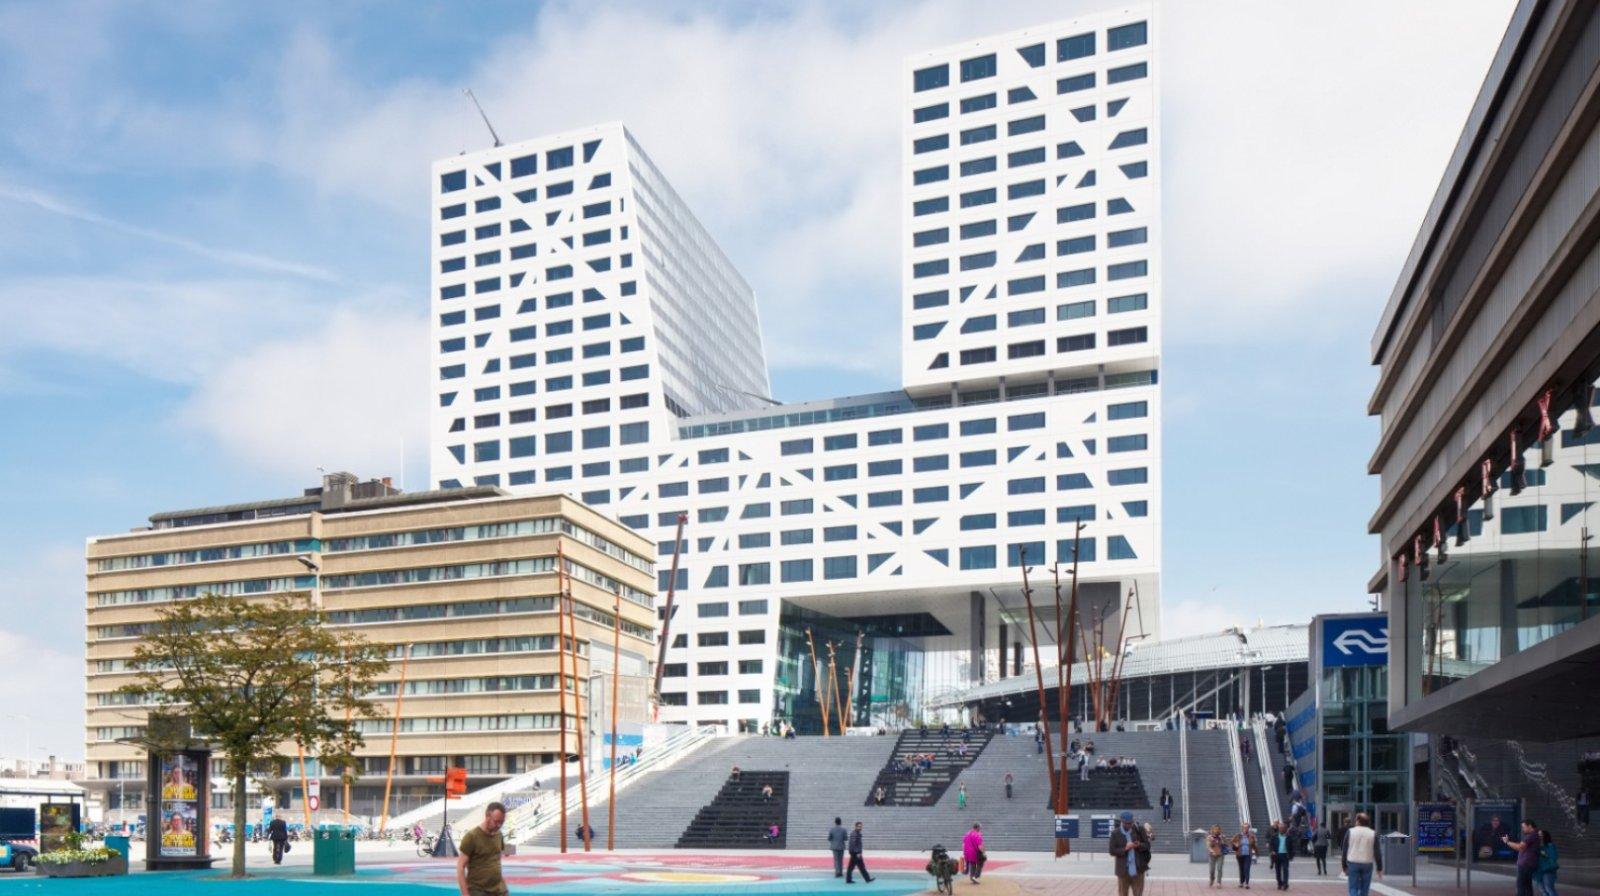 City Hall Utrecht By Kraaijvanger A As Architecture